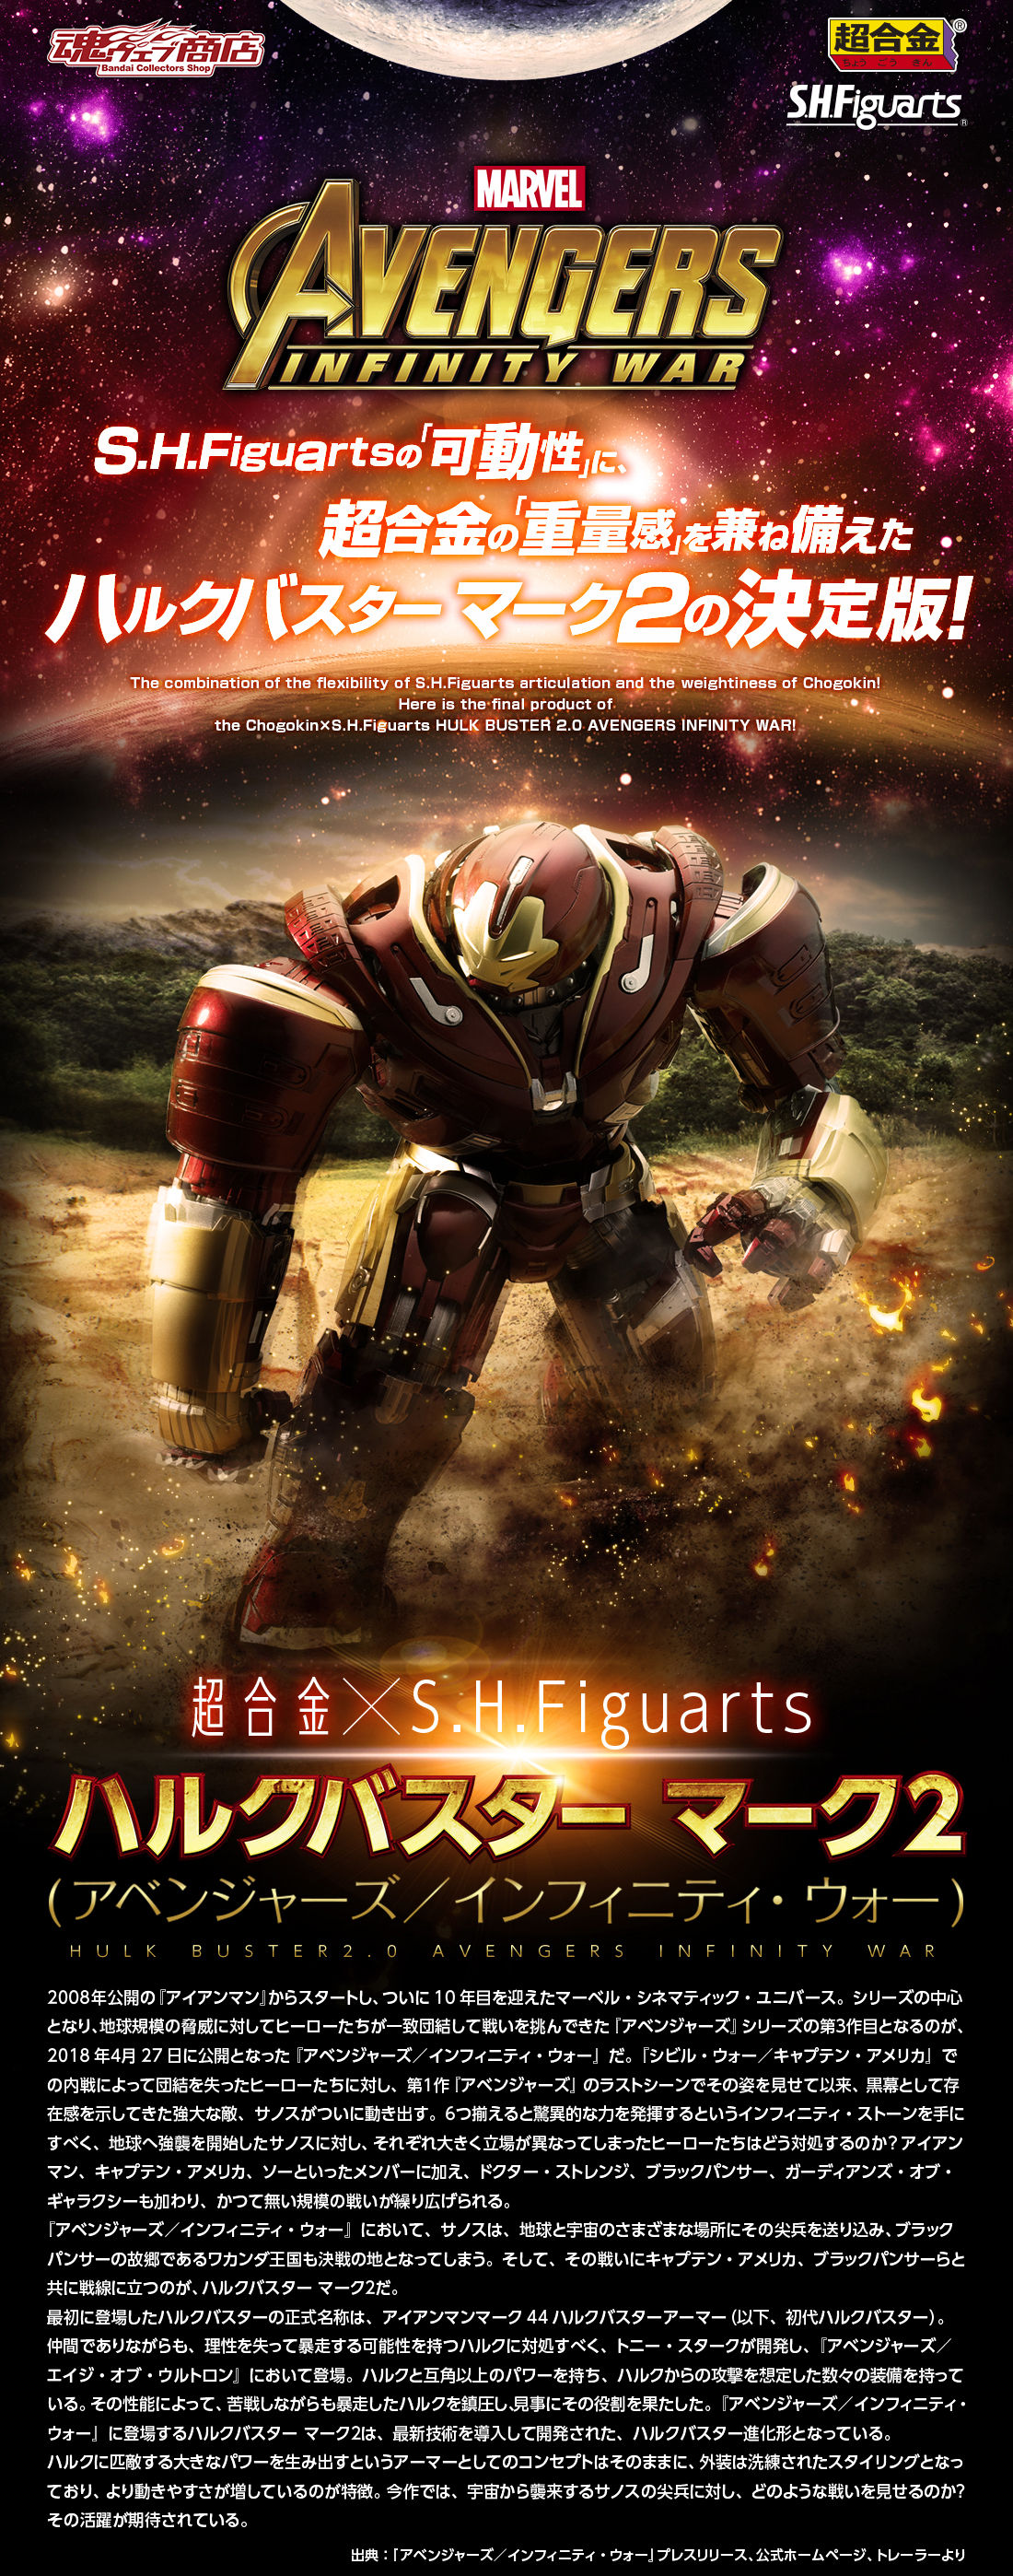 CHOGOKIN X S.H.FIGUARTS HULKBUSTER MARK 2 (AVENGERS/INFINITY WAR)